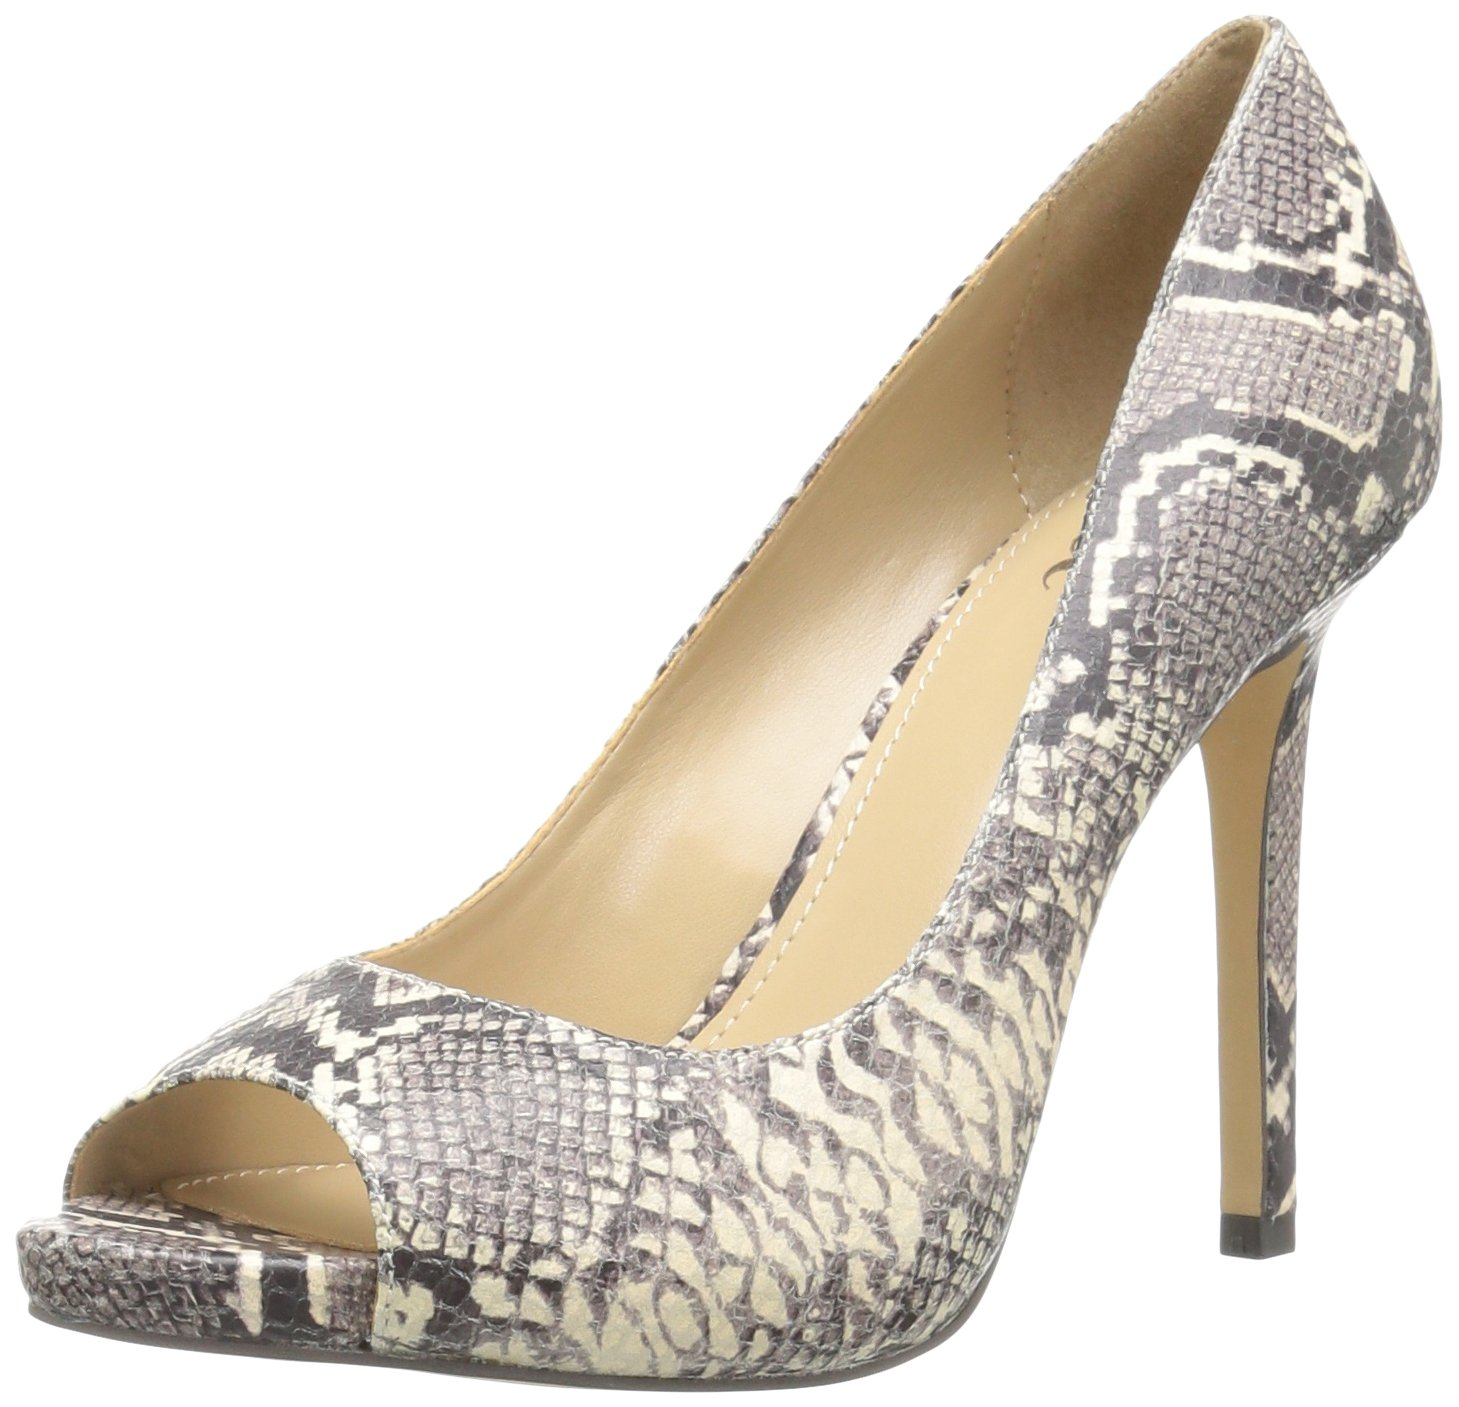 The Fix Women's Rosalee Peep Toe Platform Stiletto Dress Pump B06XH6XB67 9.5 B(M) US|Mushroom Python Print